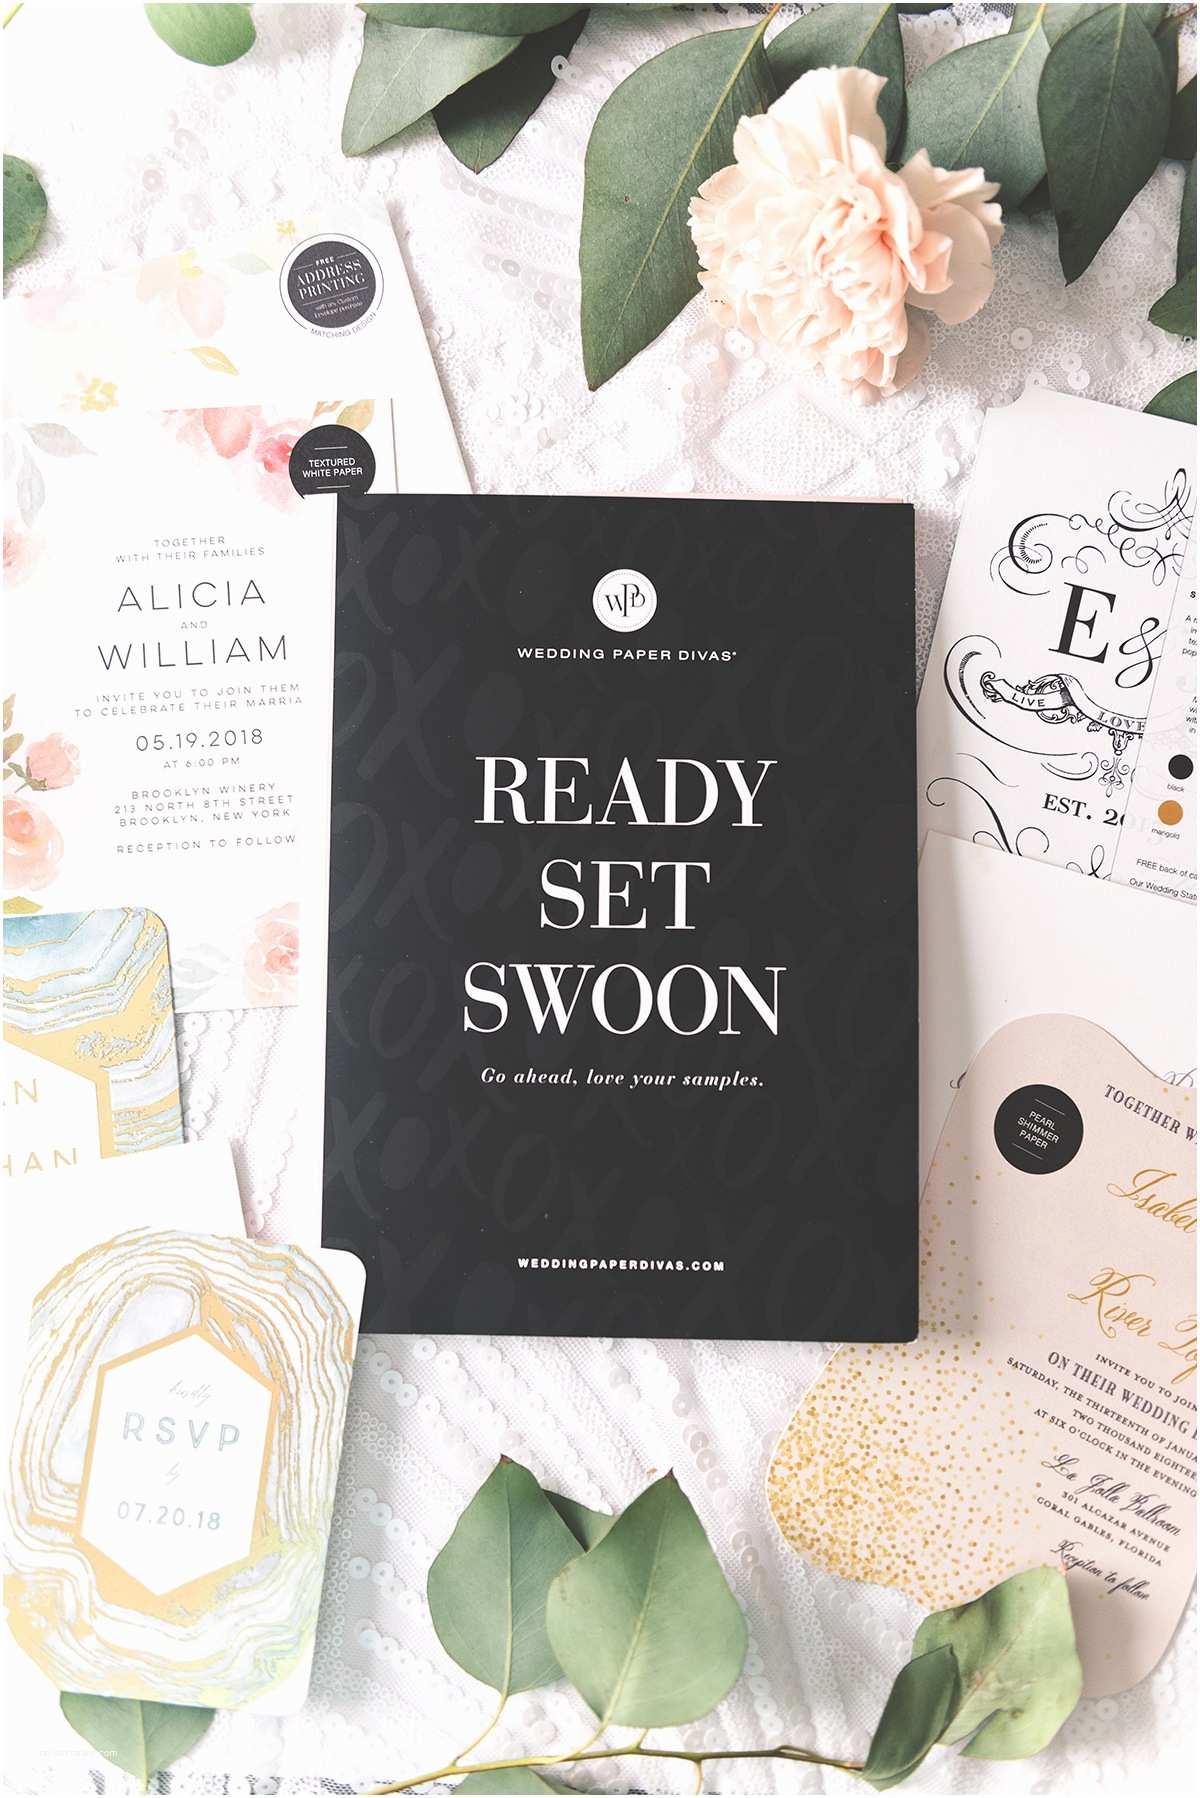 Wedding Divas Wedding Invitations Invitations for Every Wedding Style From Wedding Paper